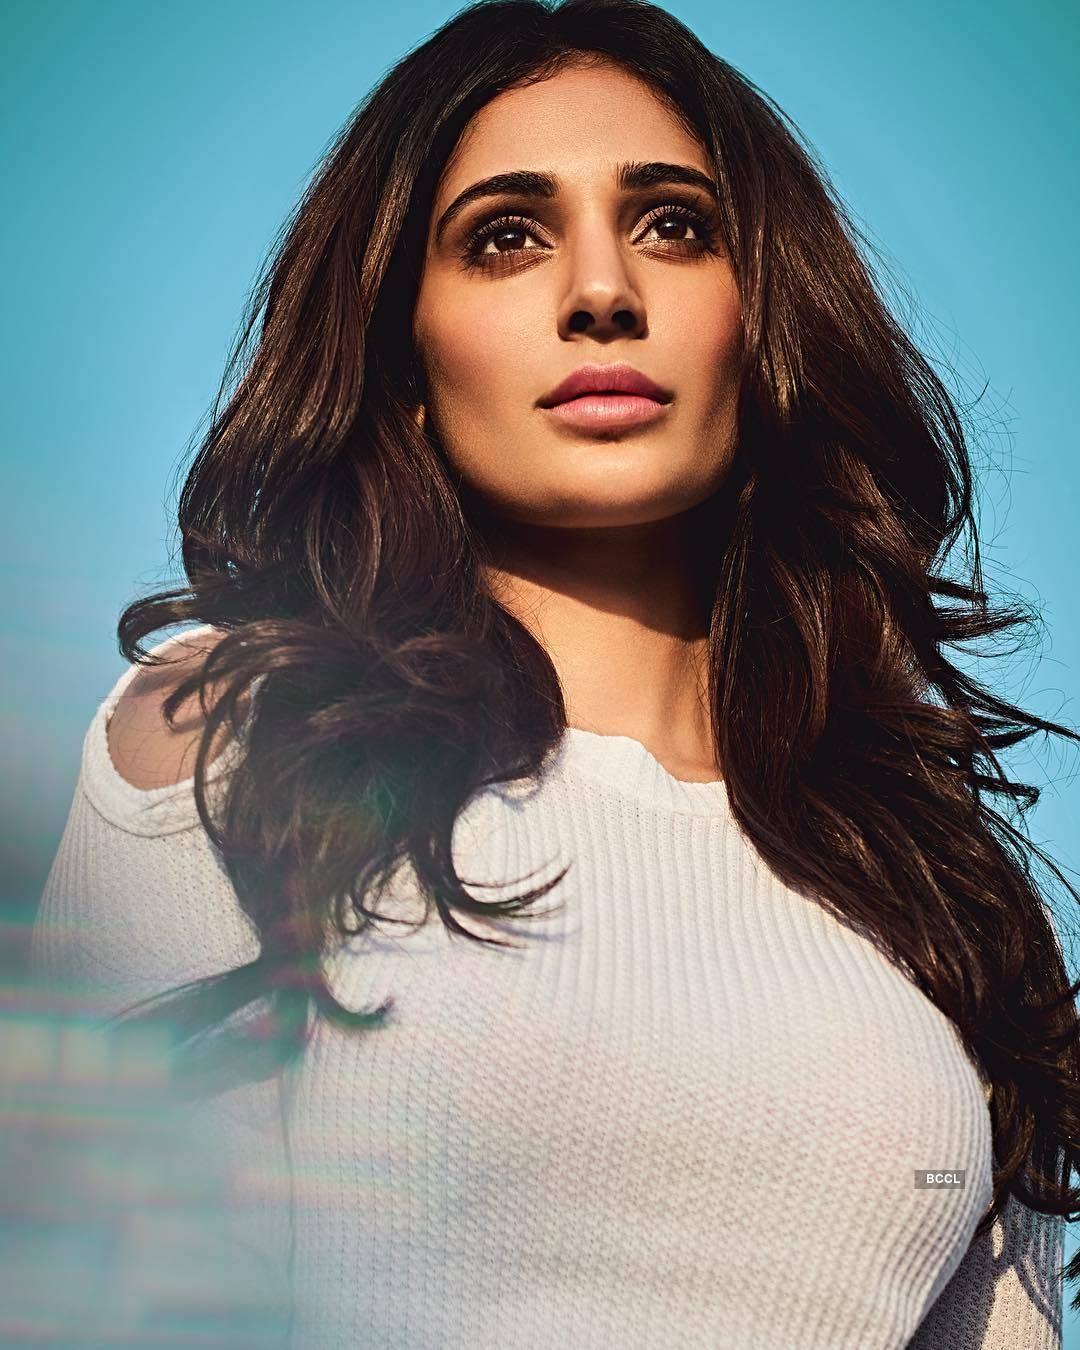 Meet the stunning supermodel & a talented actress Alankrita Sahai